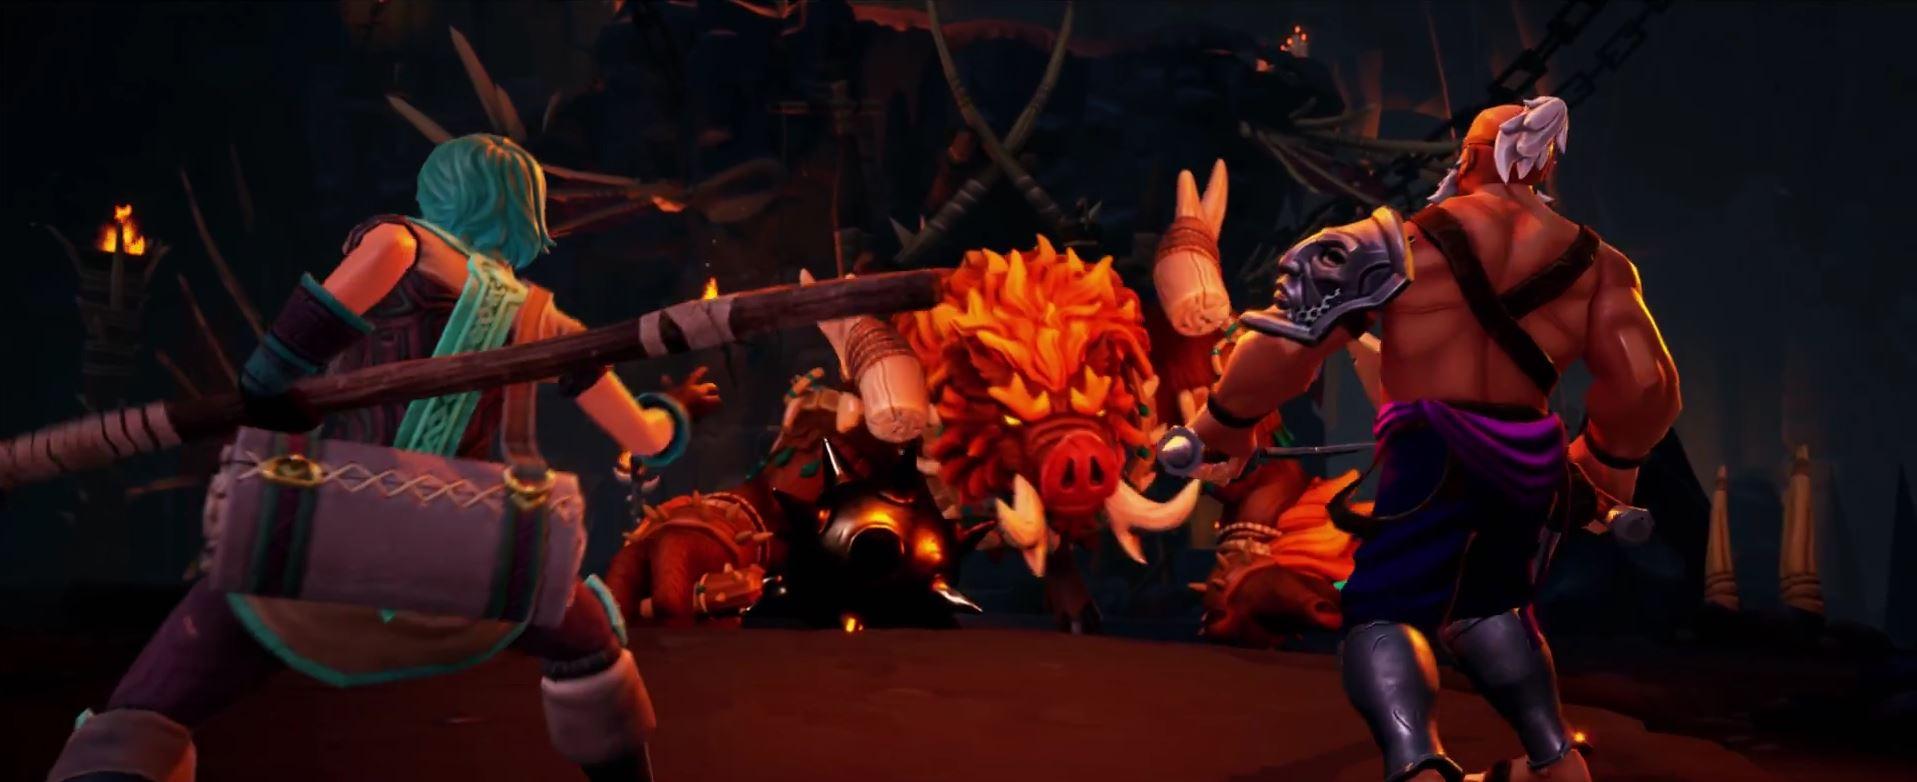 Torchlight Trailer Screenshot Feuersau